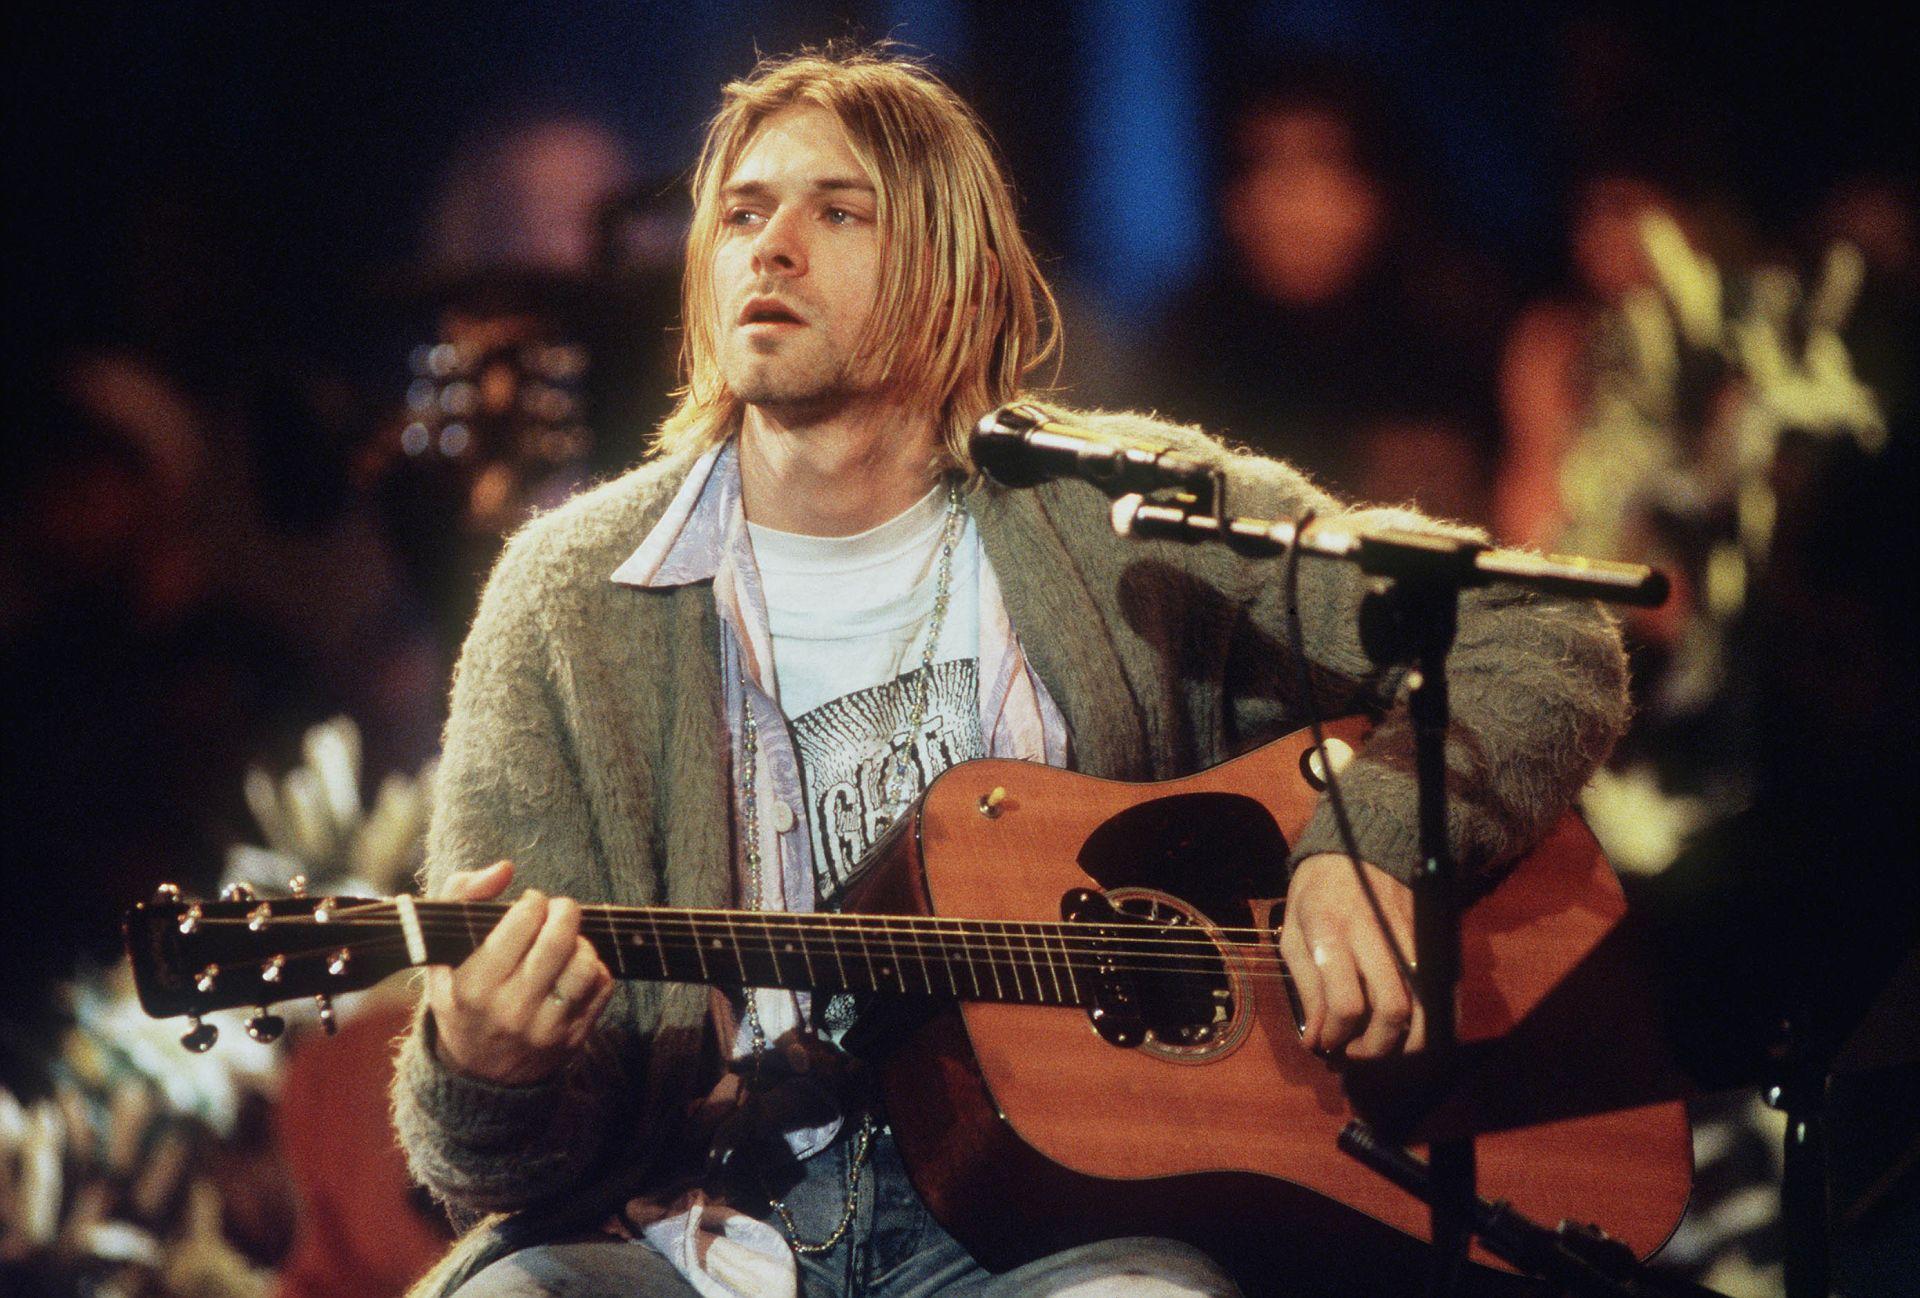 Kurt Cobain az MTV Unplugged felvételén 1993-ban.